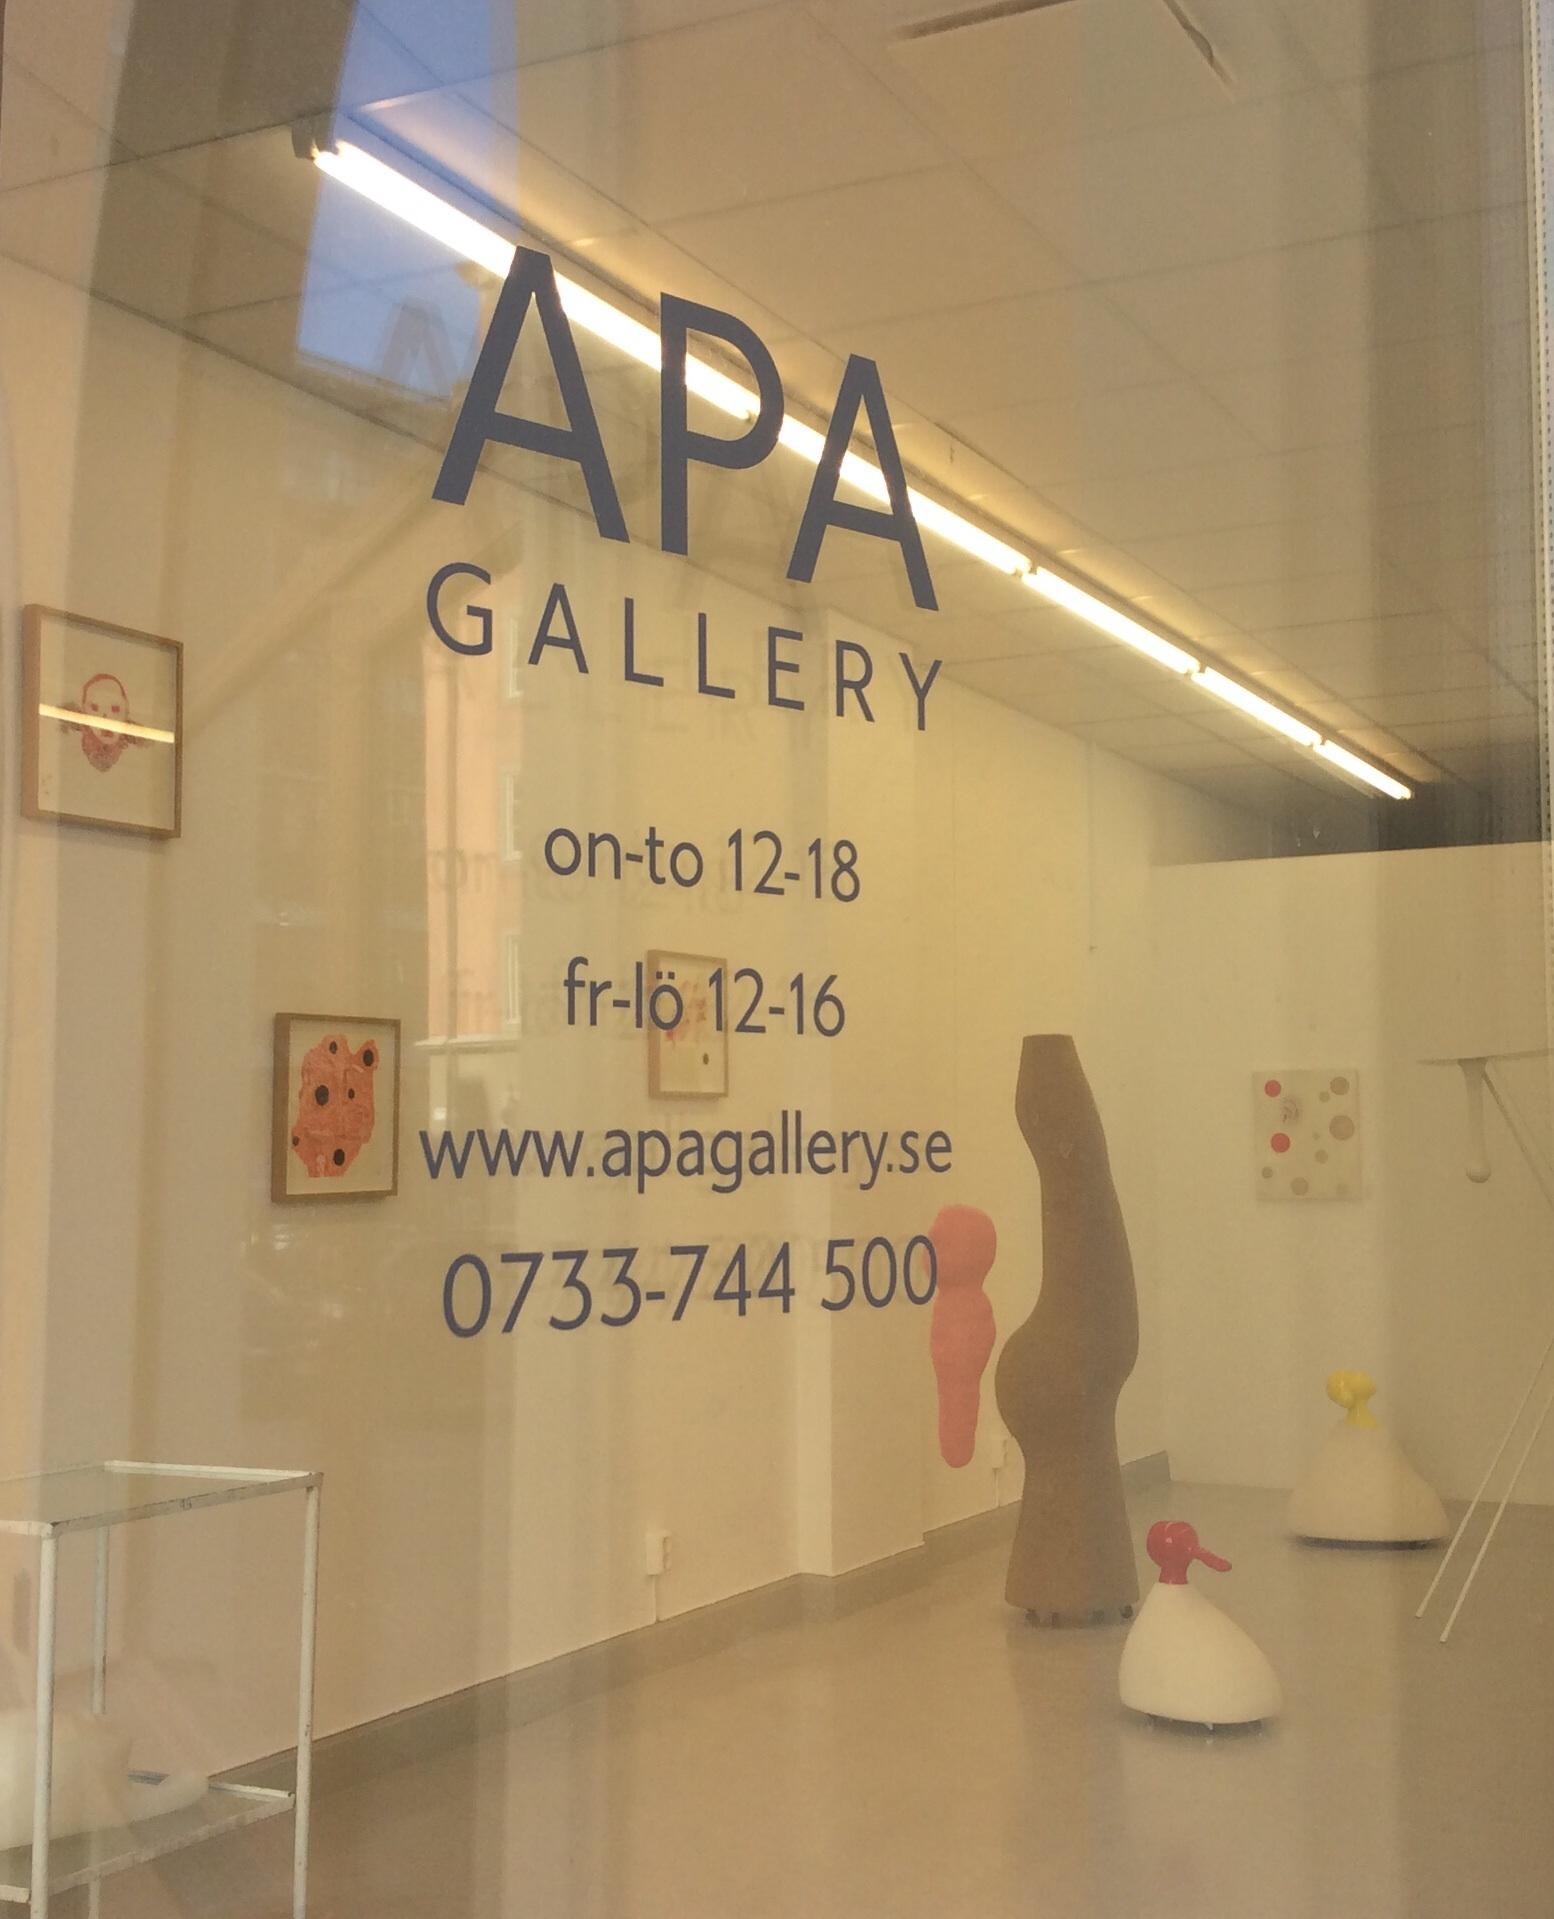 APA Gallery